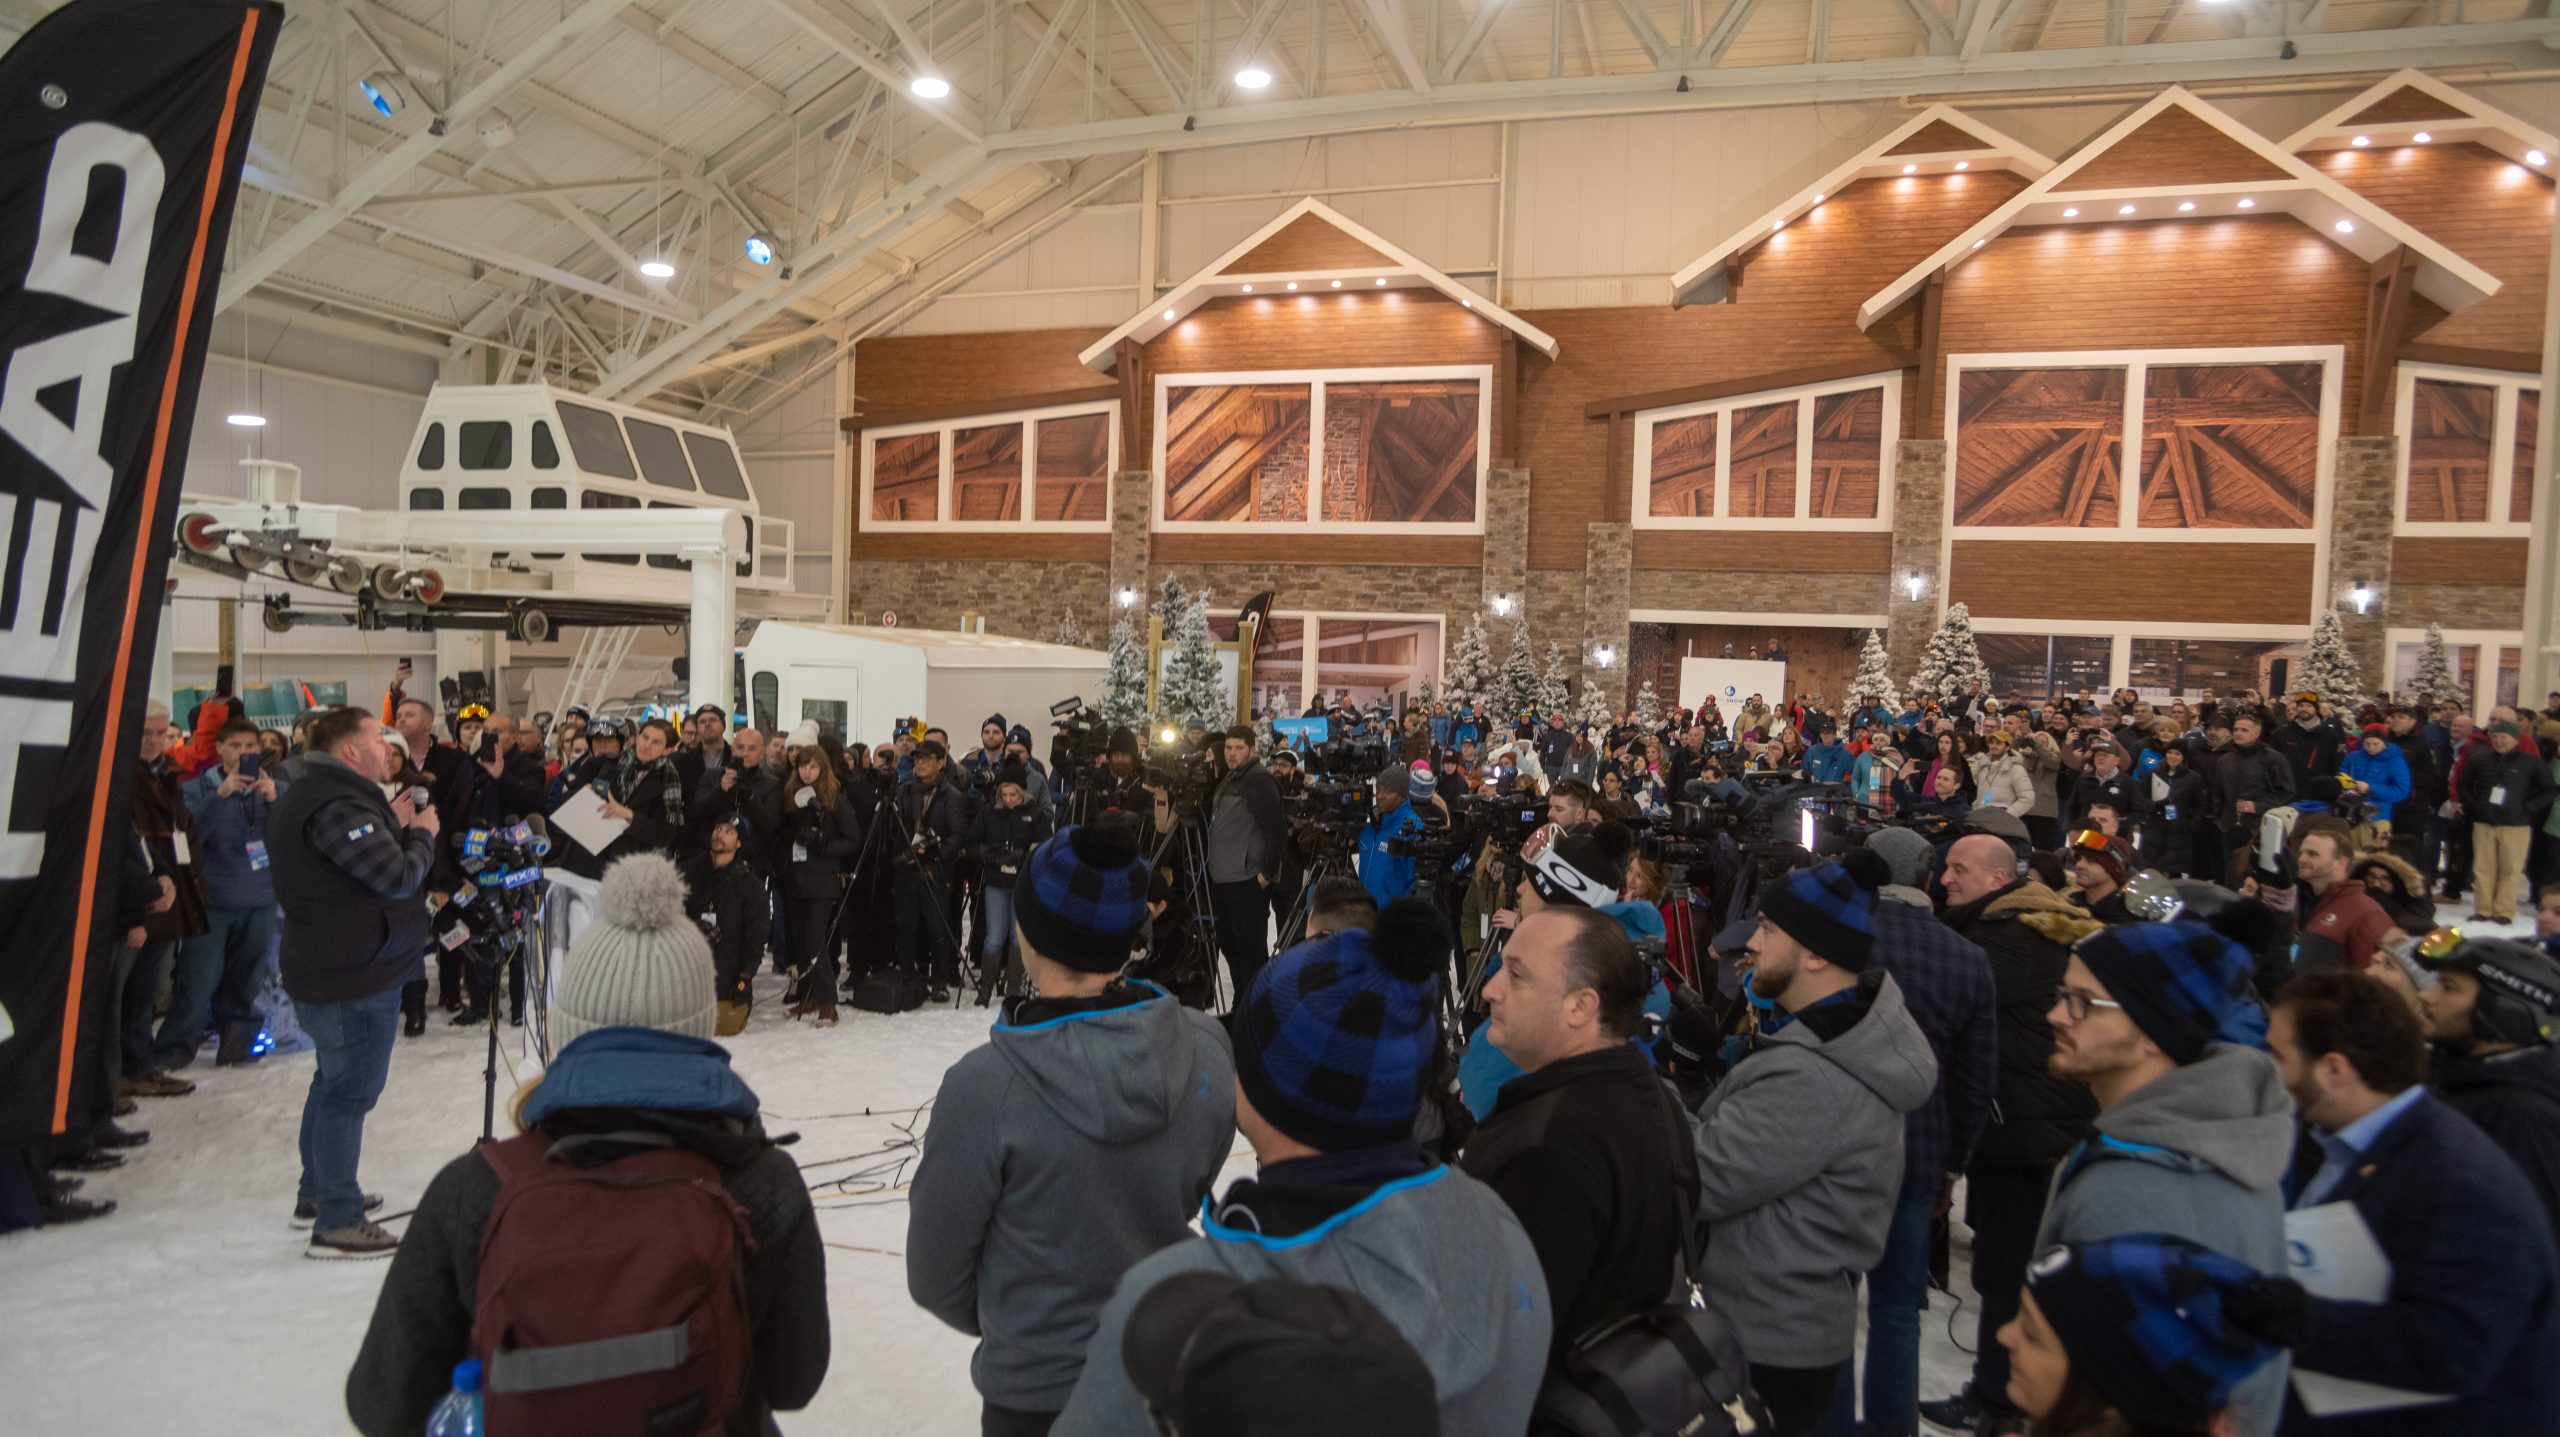 Big SNOW American Dream's Grand Opening